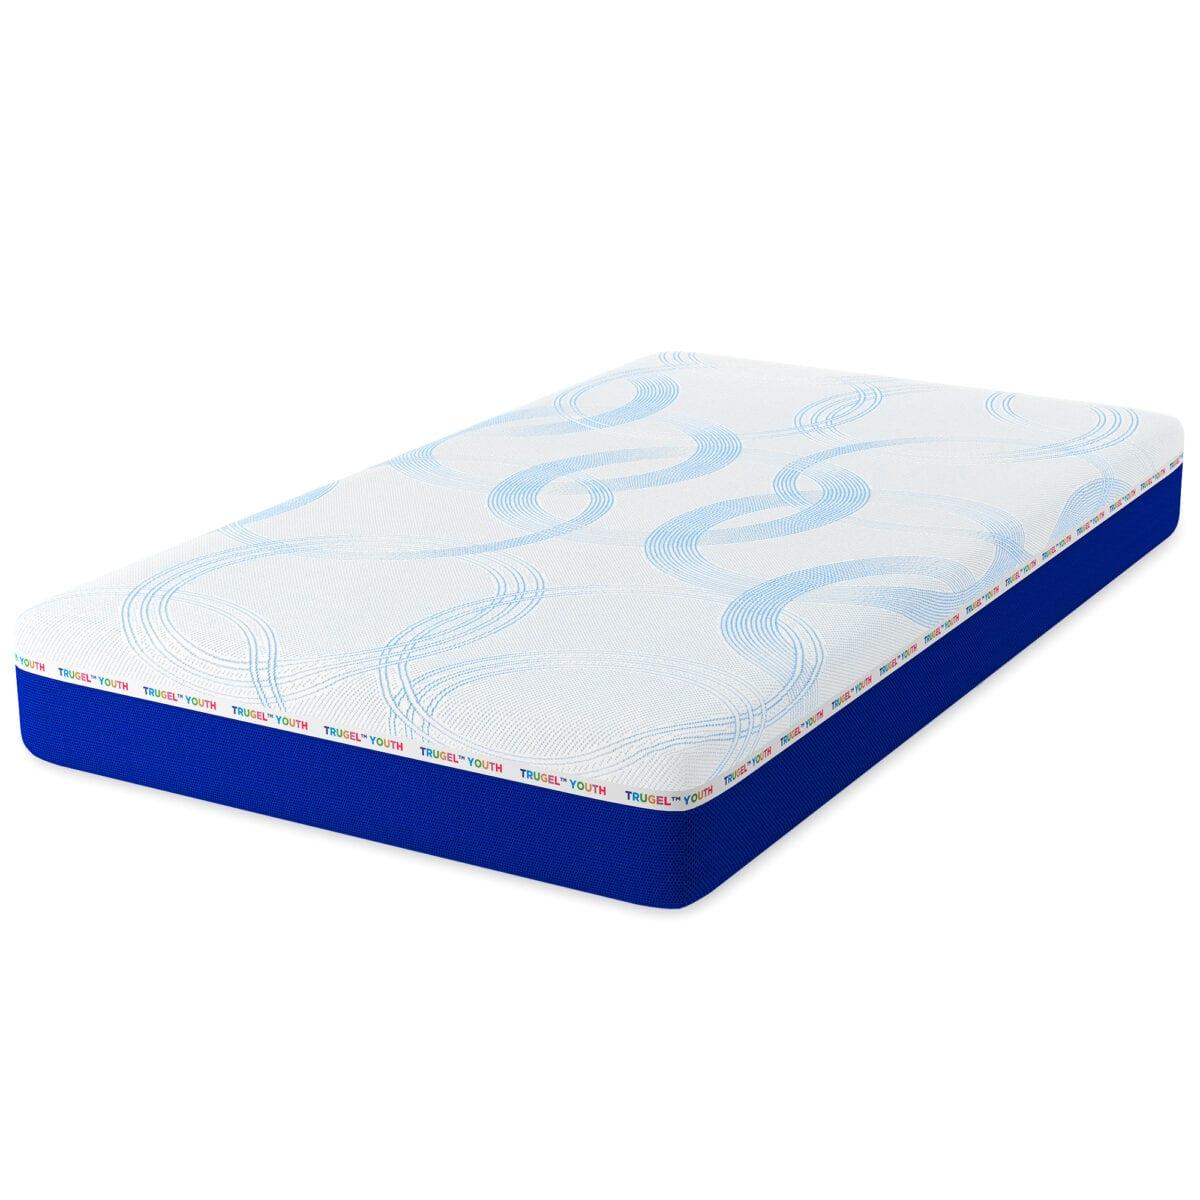 Image of Blue Youth Memory Foam Mattress